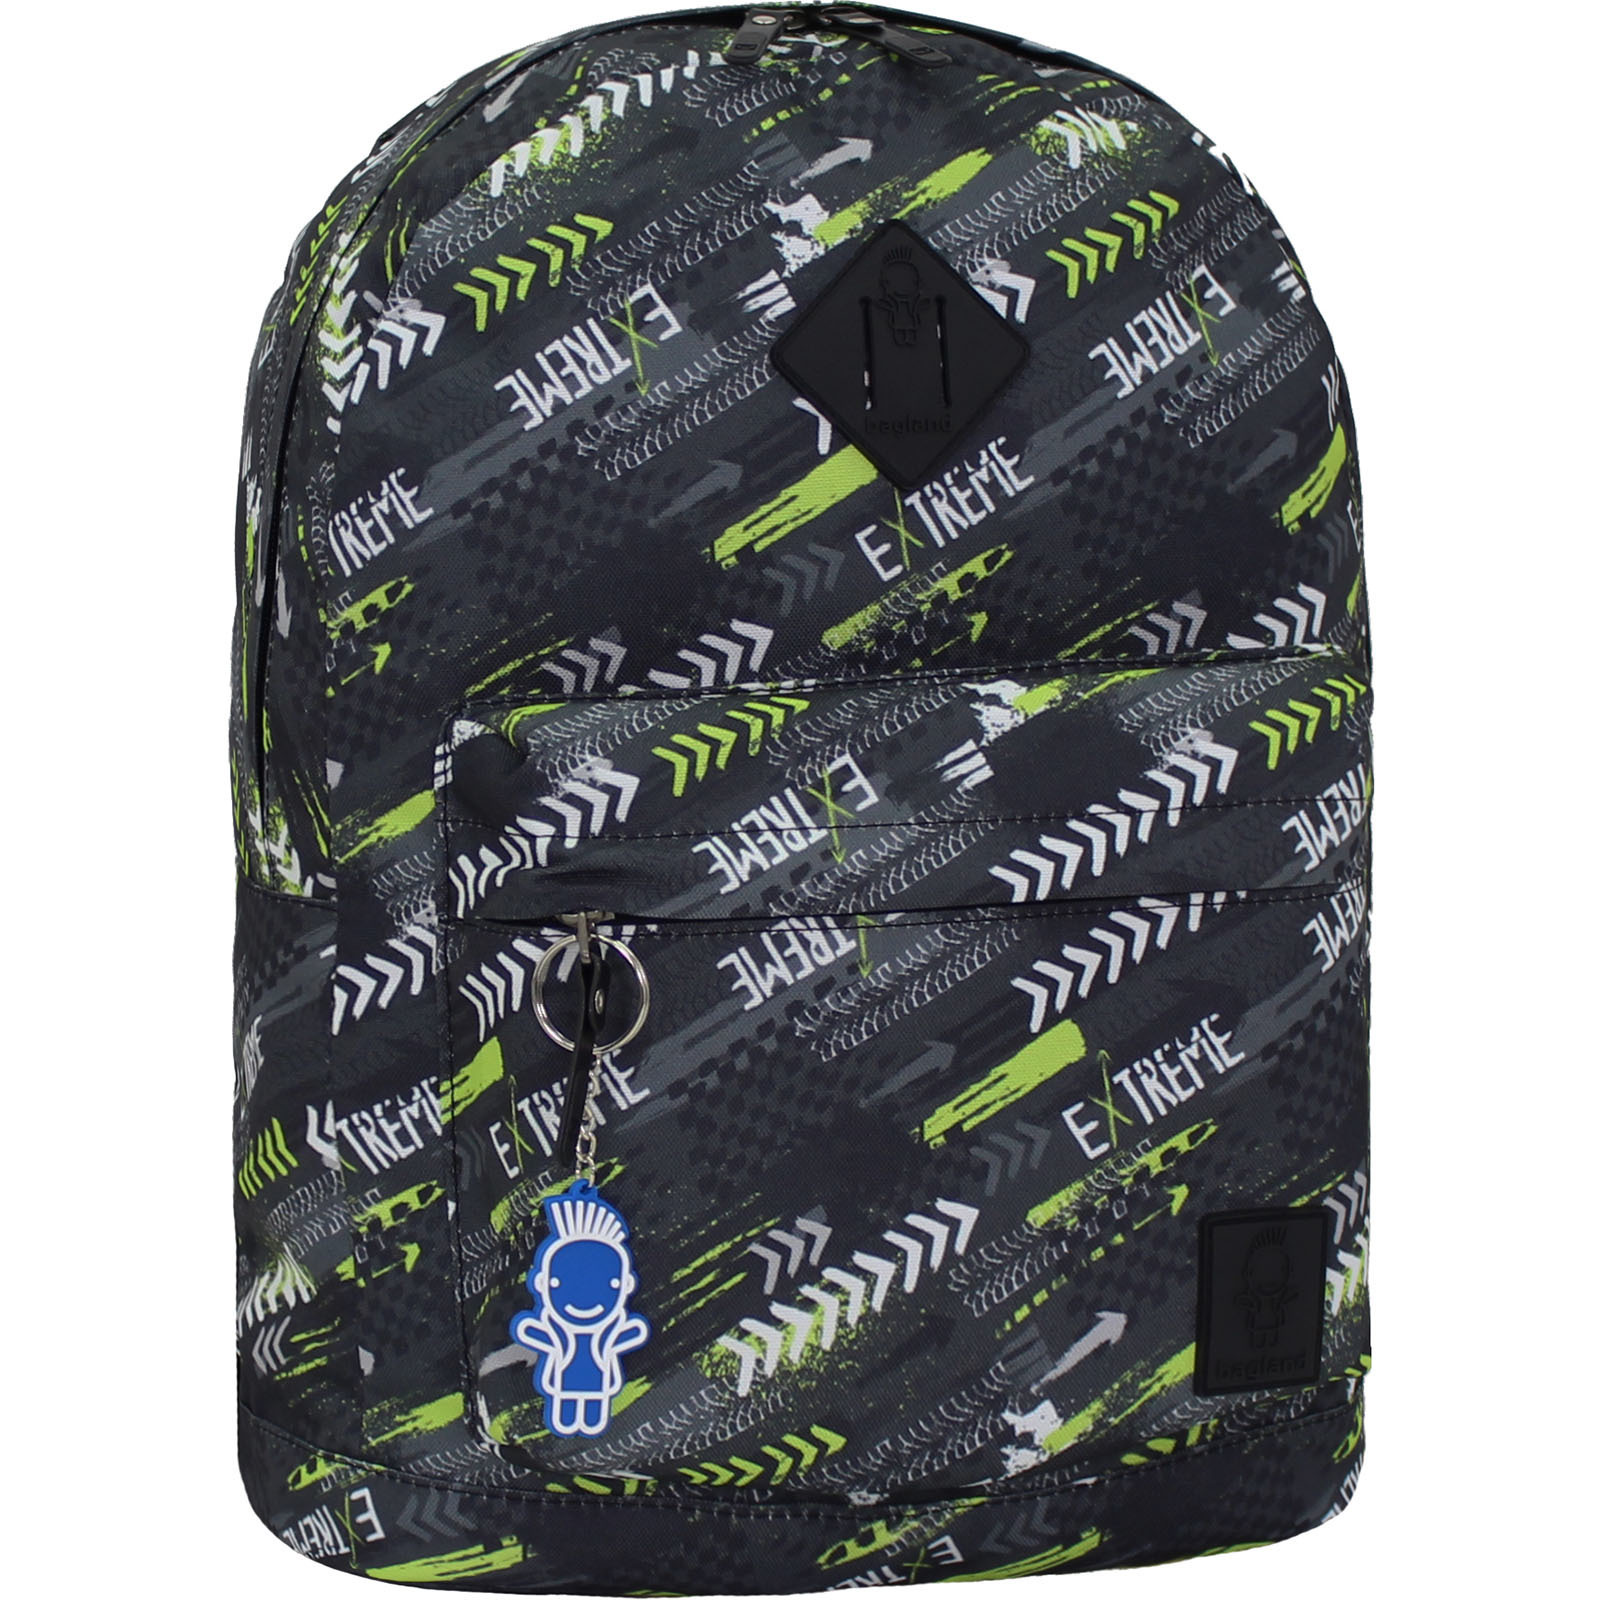 Городские рюкзаки Рюкзак Bagland Молодежный (дизайн) 17 л. сублимация 256 (00533664) IMG_1149_256.JPG